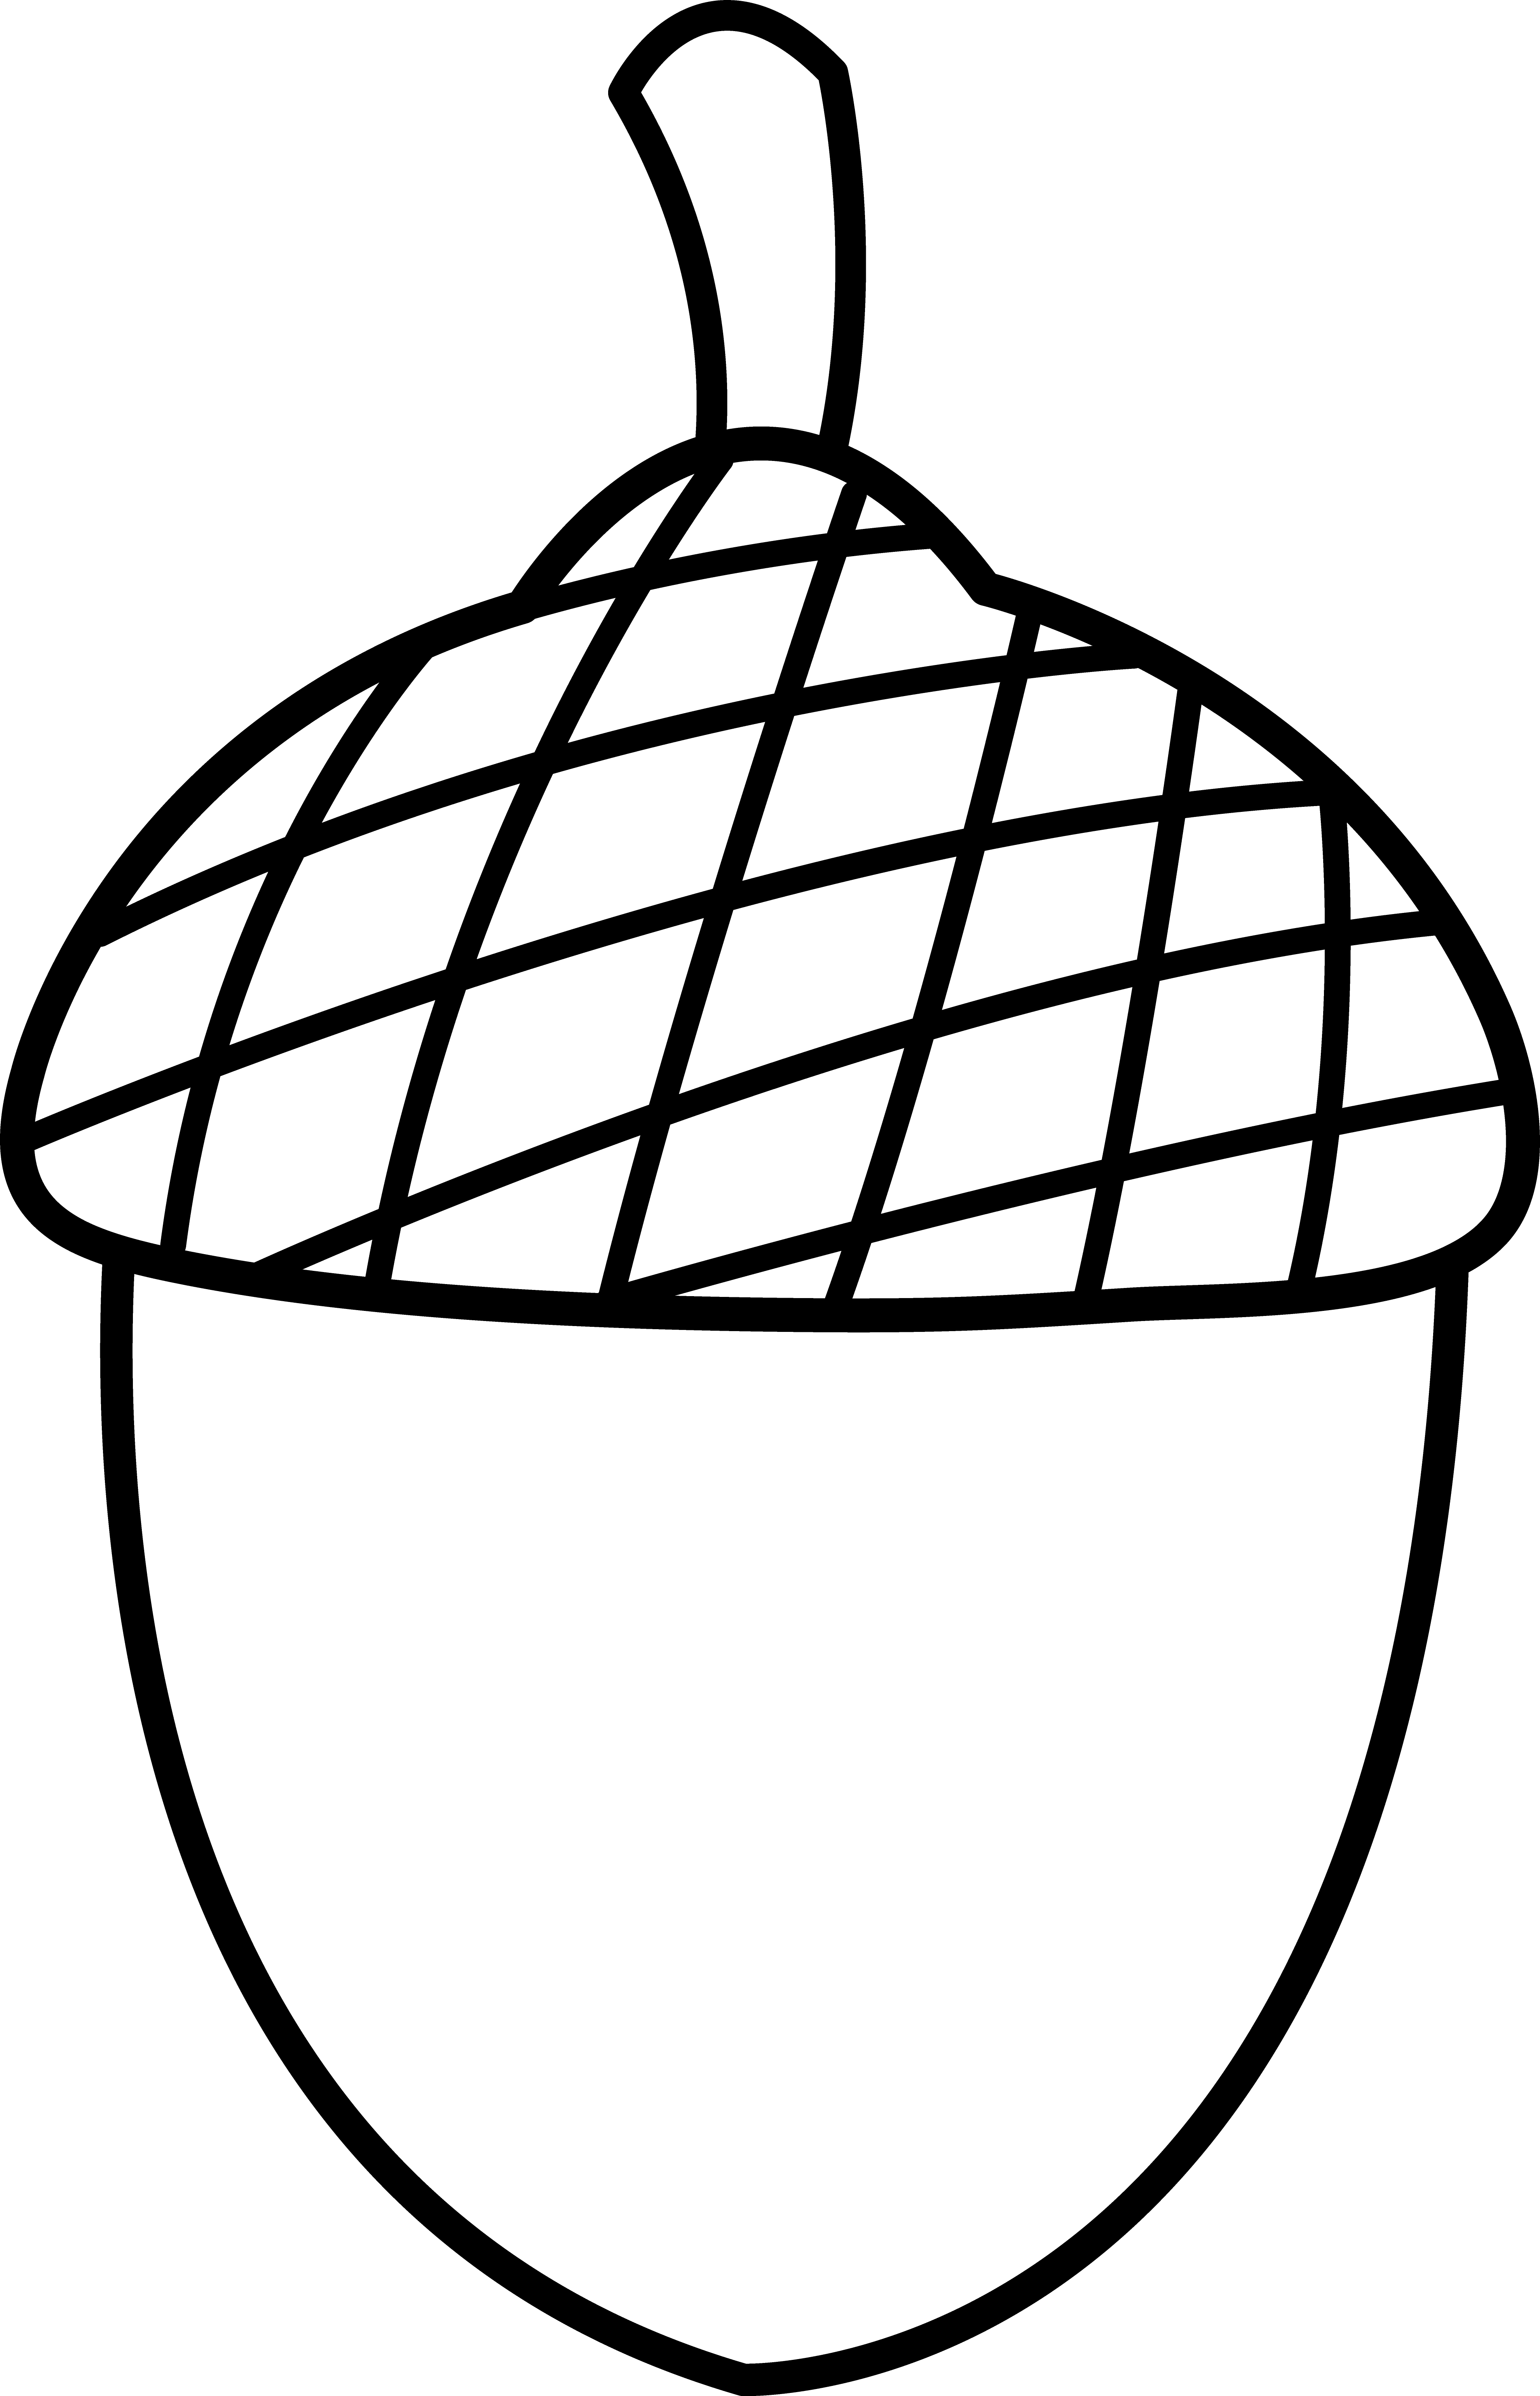 Acorn . Pomegranate clipart black and white